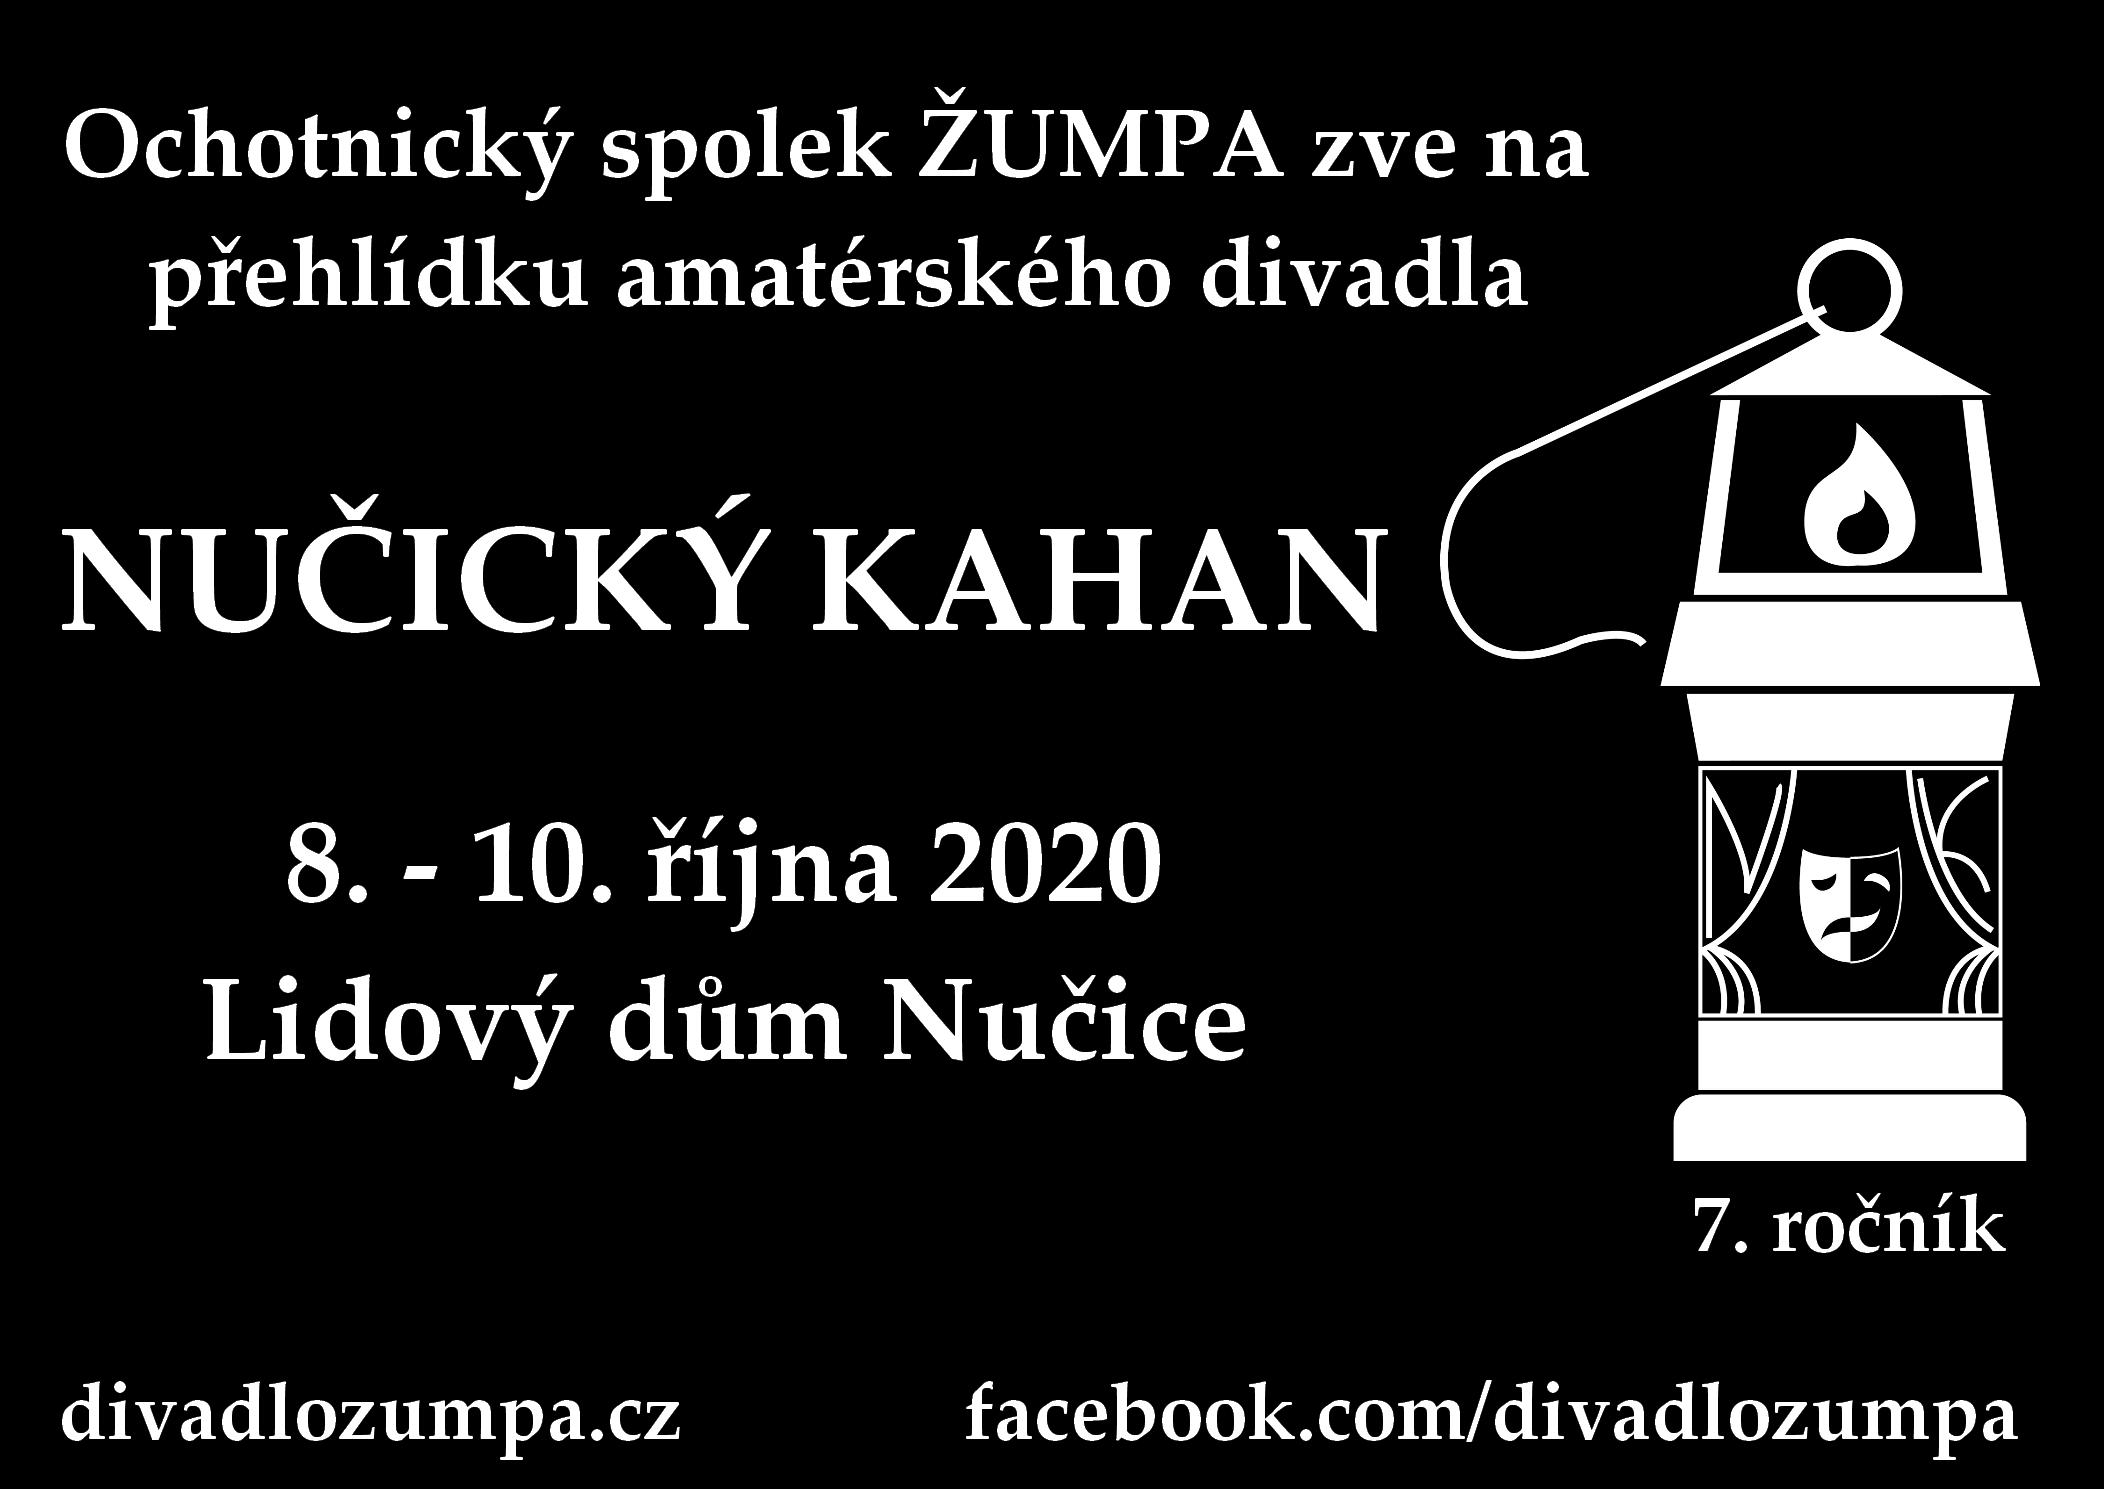 Nučický Kahan 2020